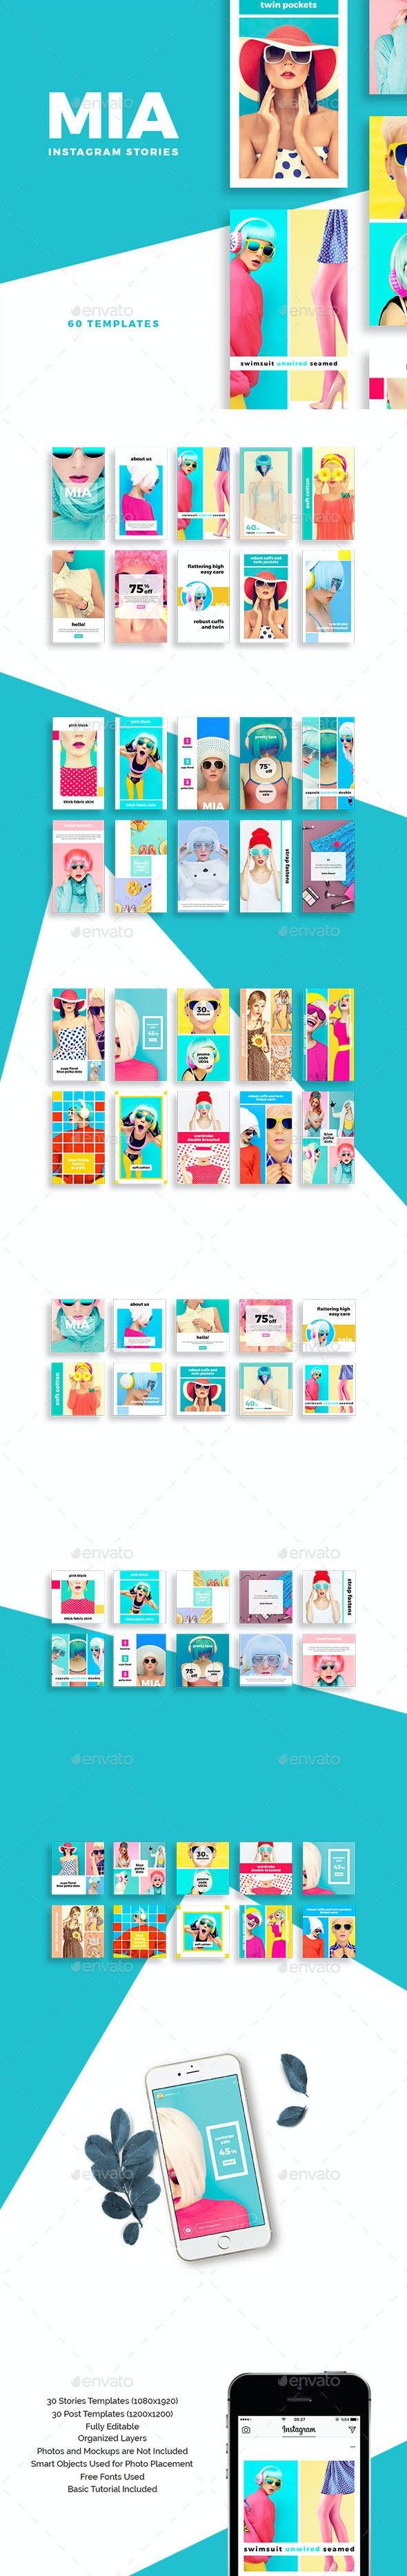 Mia Instagram Stories Pack - Social Media Web Elements